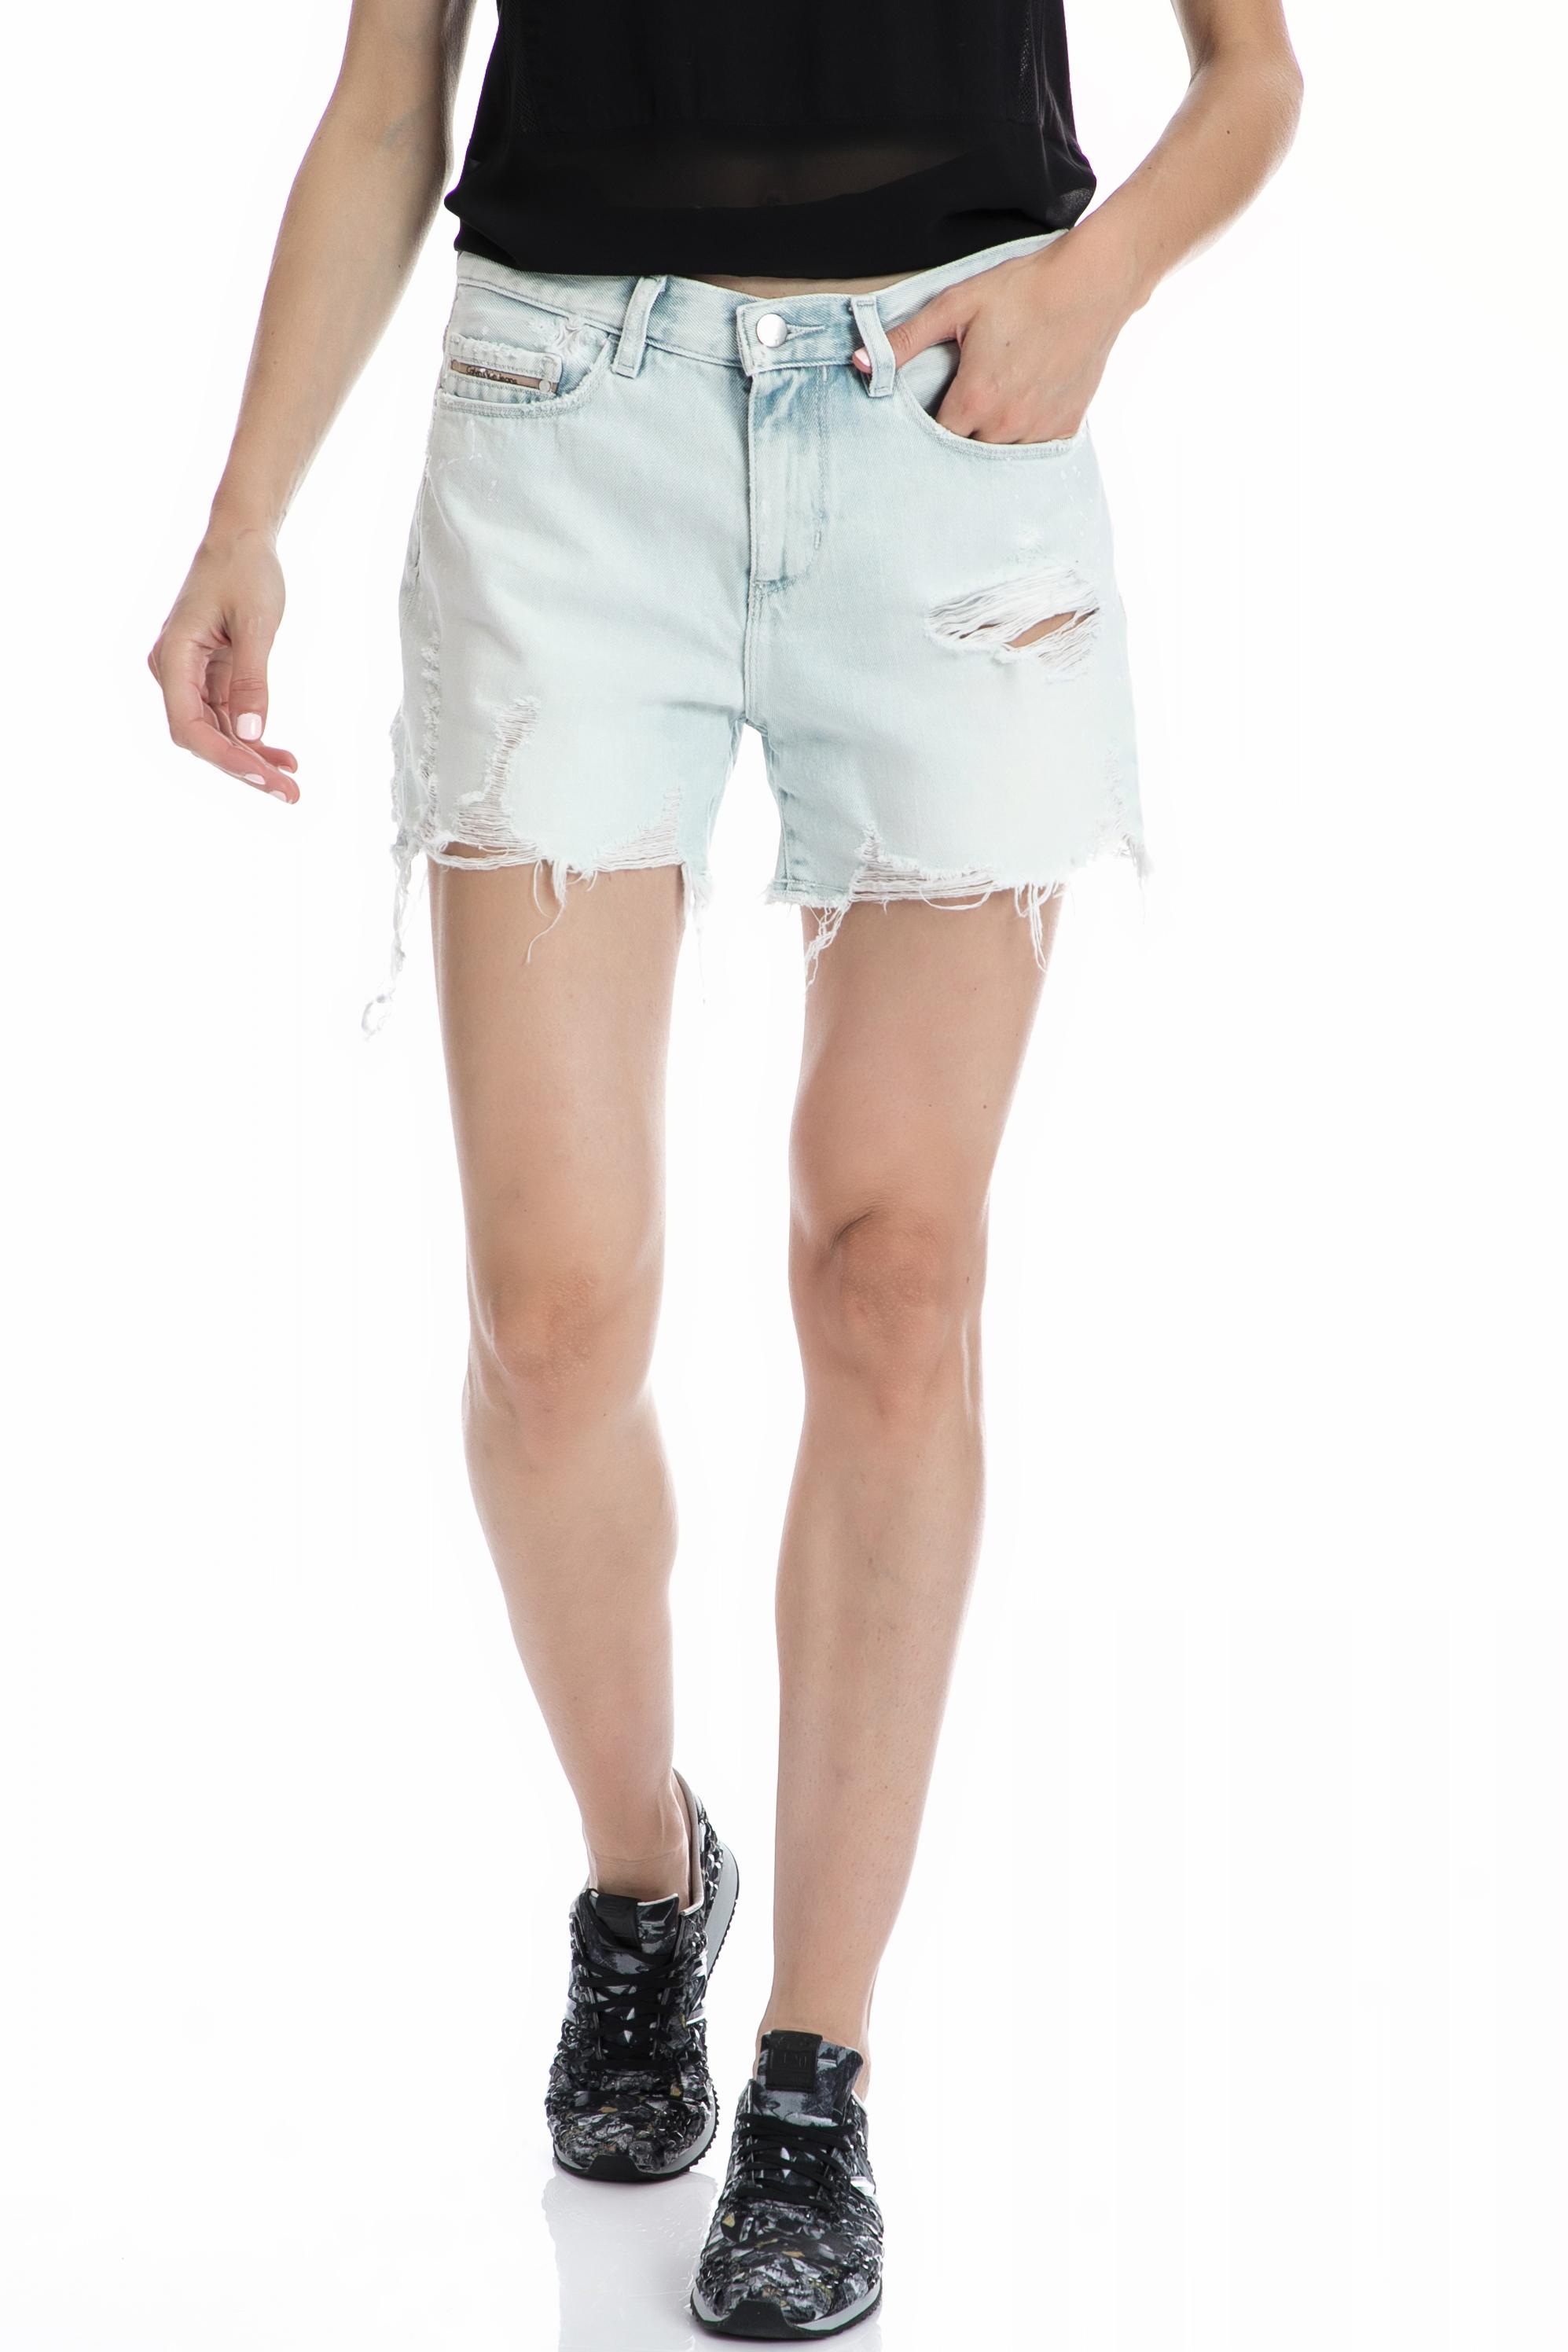 CALVIN KLEIN JEANS - Γυναικείο σορτς CALVIN KLEIN JEANS μπλε γυναικεία ρούχα σορτς βερμούδες casual jean